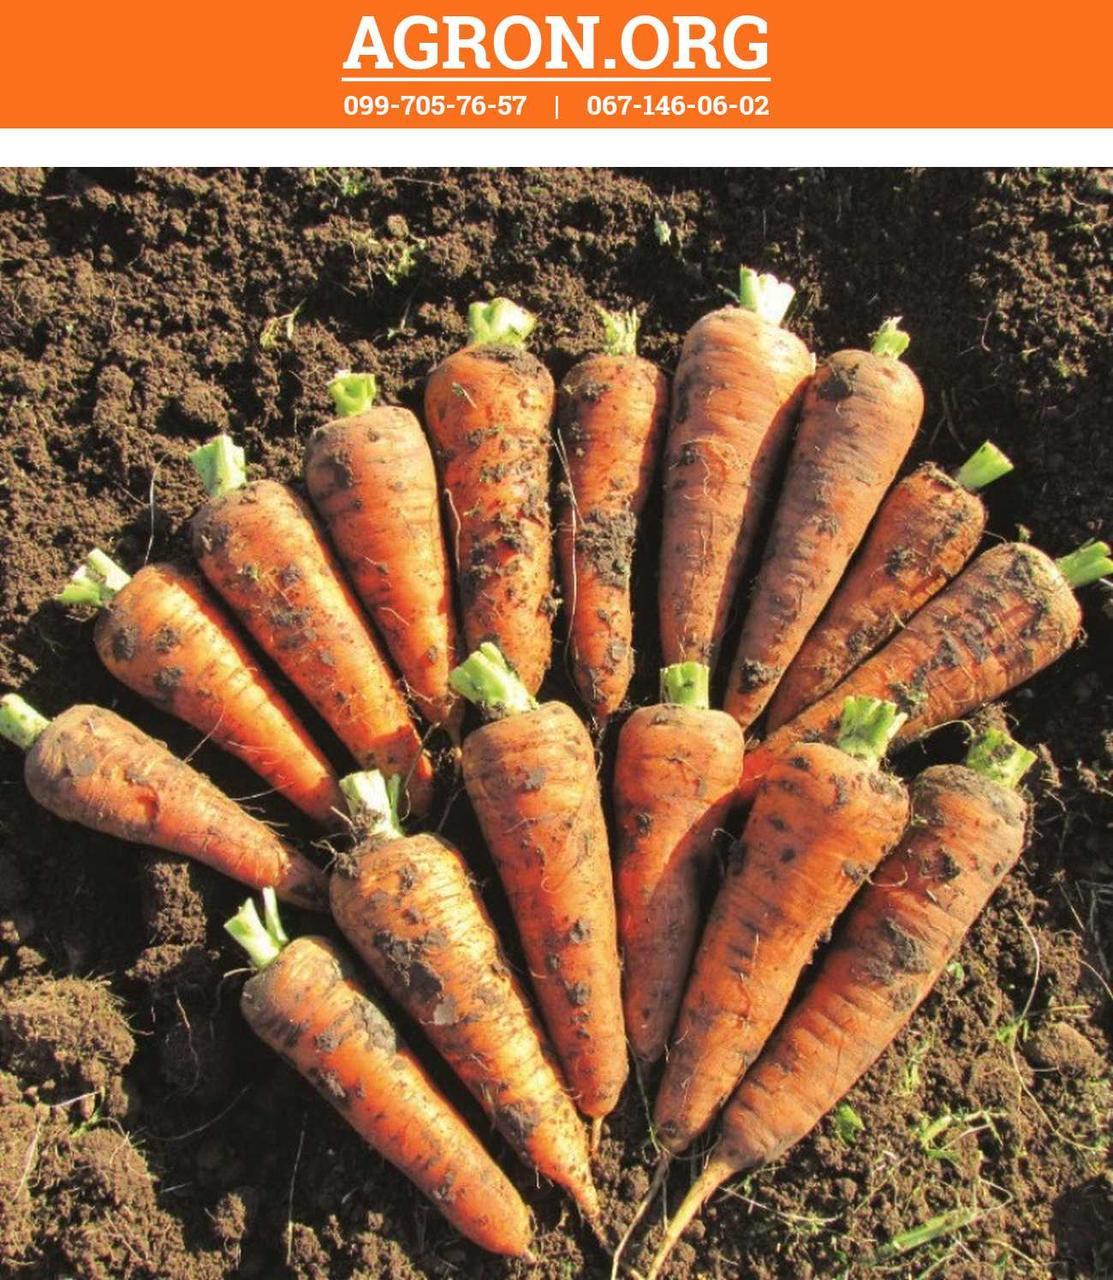 ЛС-2513 F1 (LS-2513 F1) семена моркови Берликум Lucky Seed 1 000 г